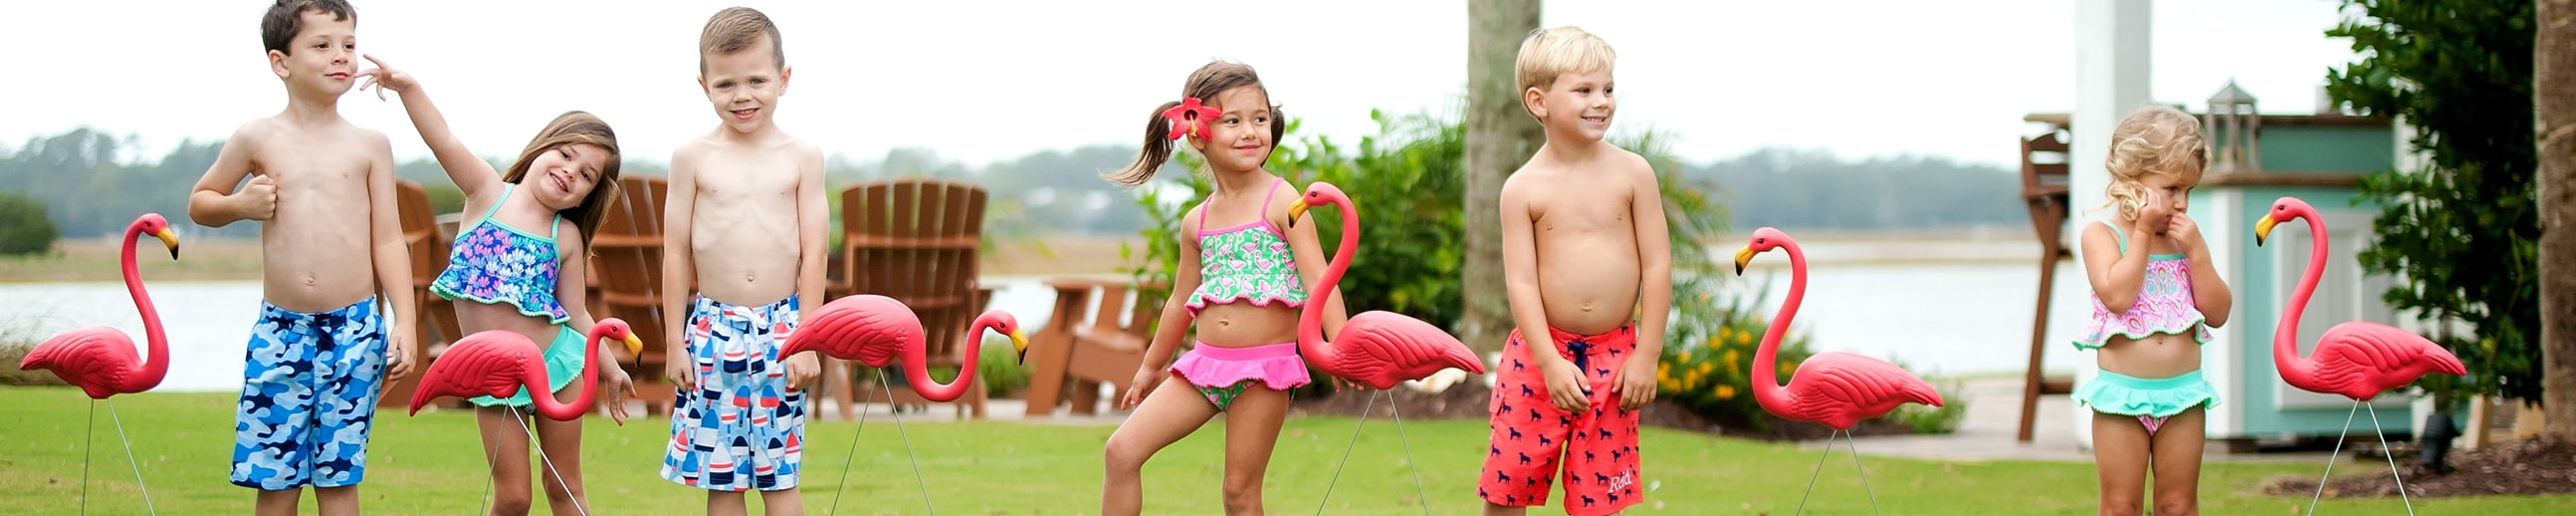 Wholesale Kids' Swim Trunks